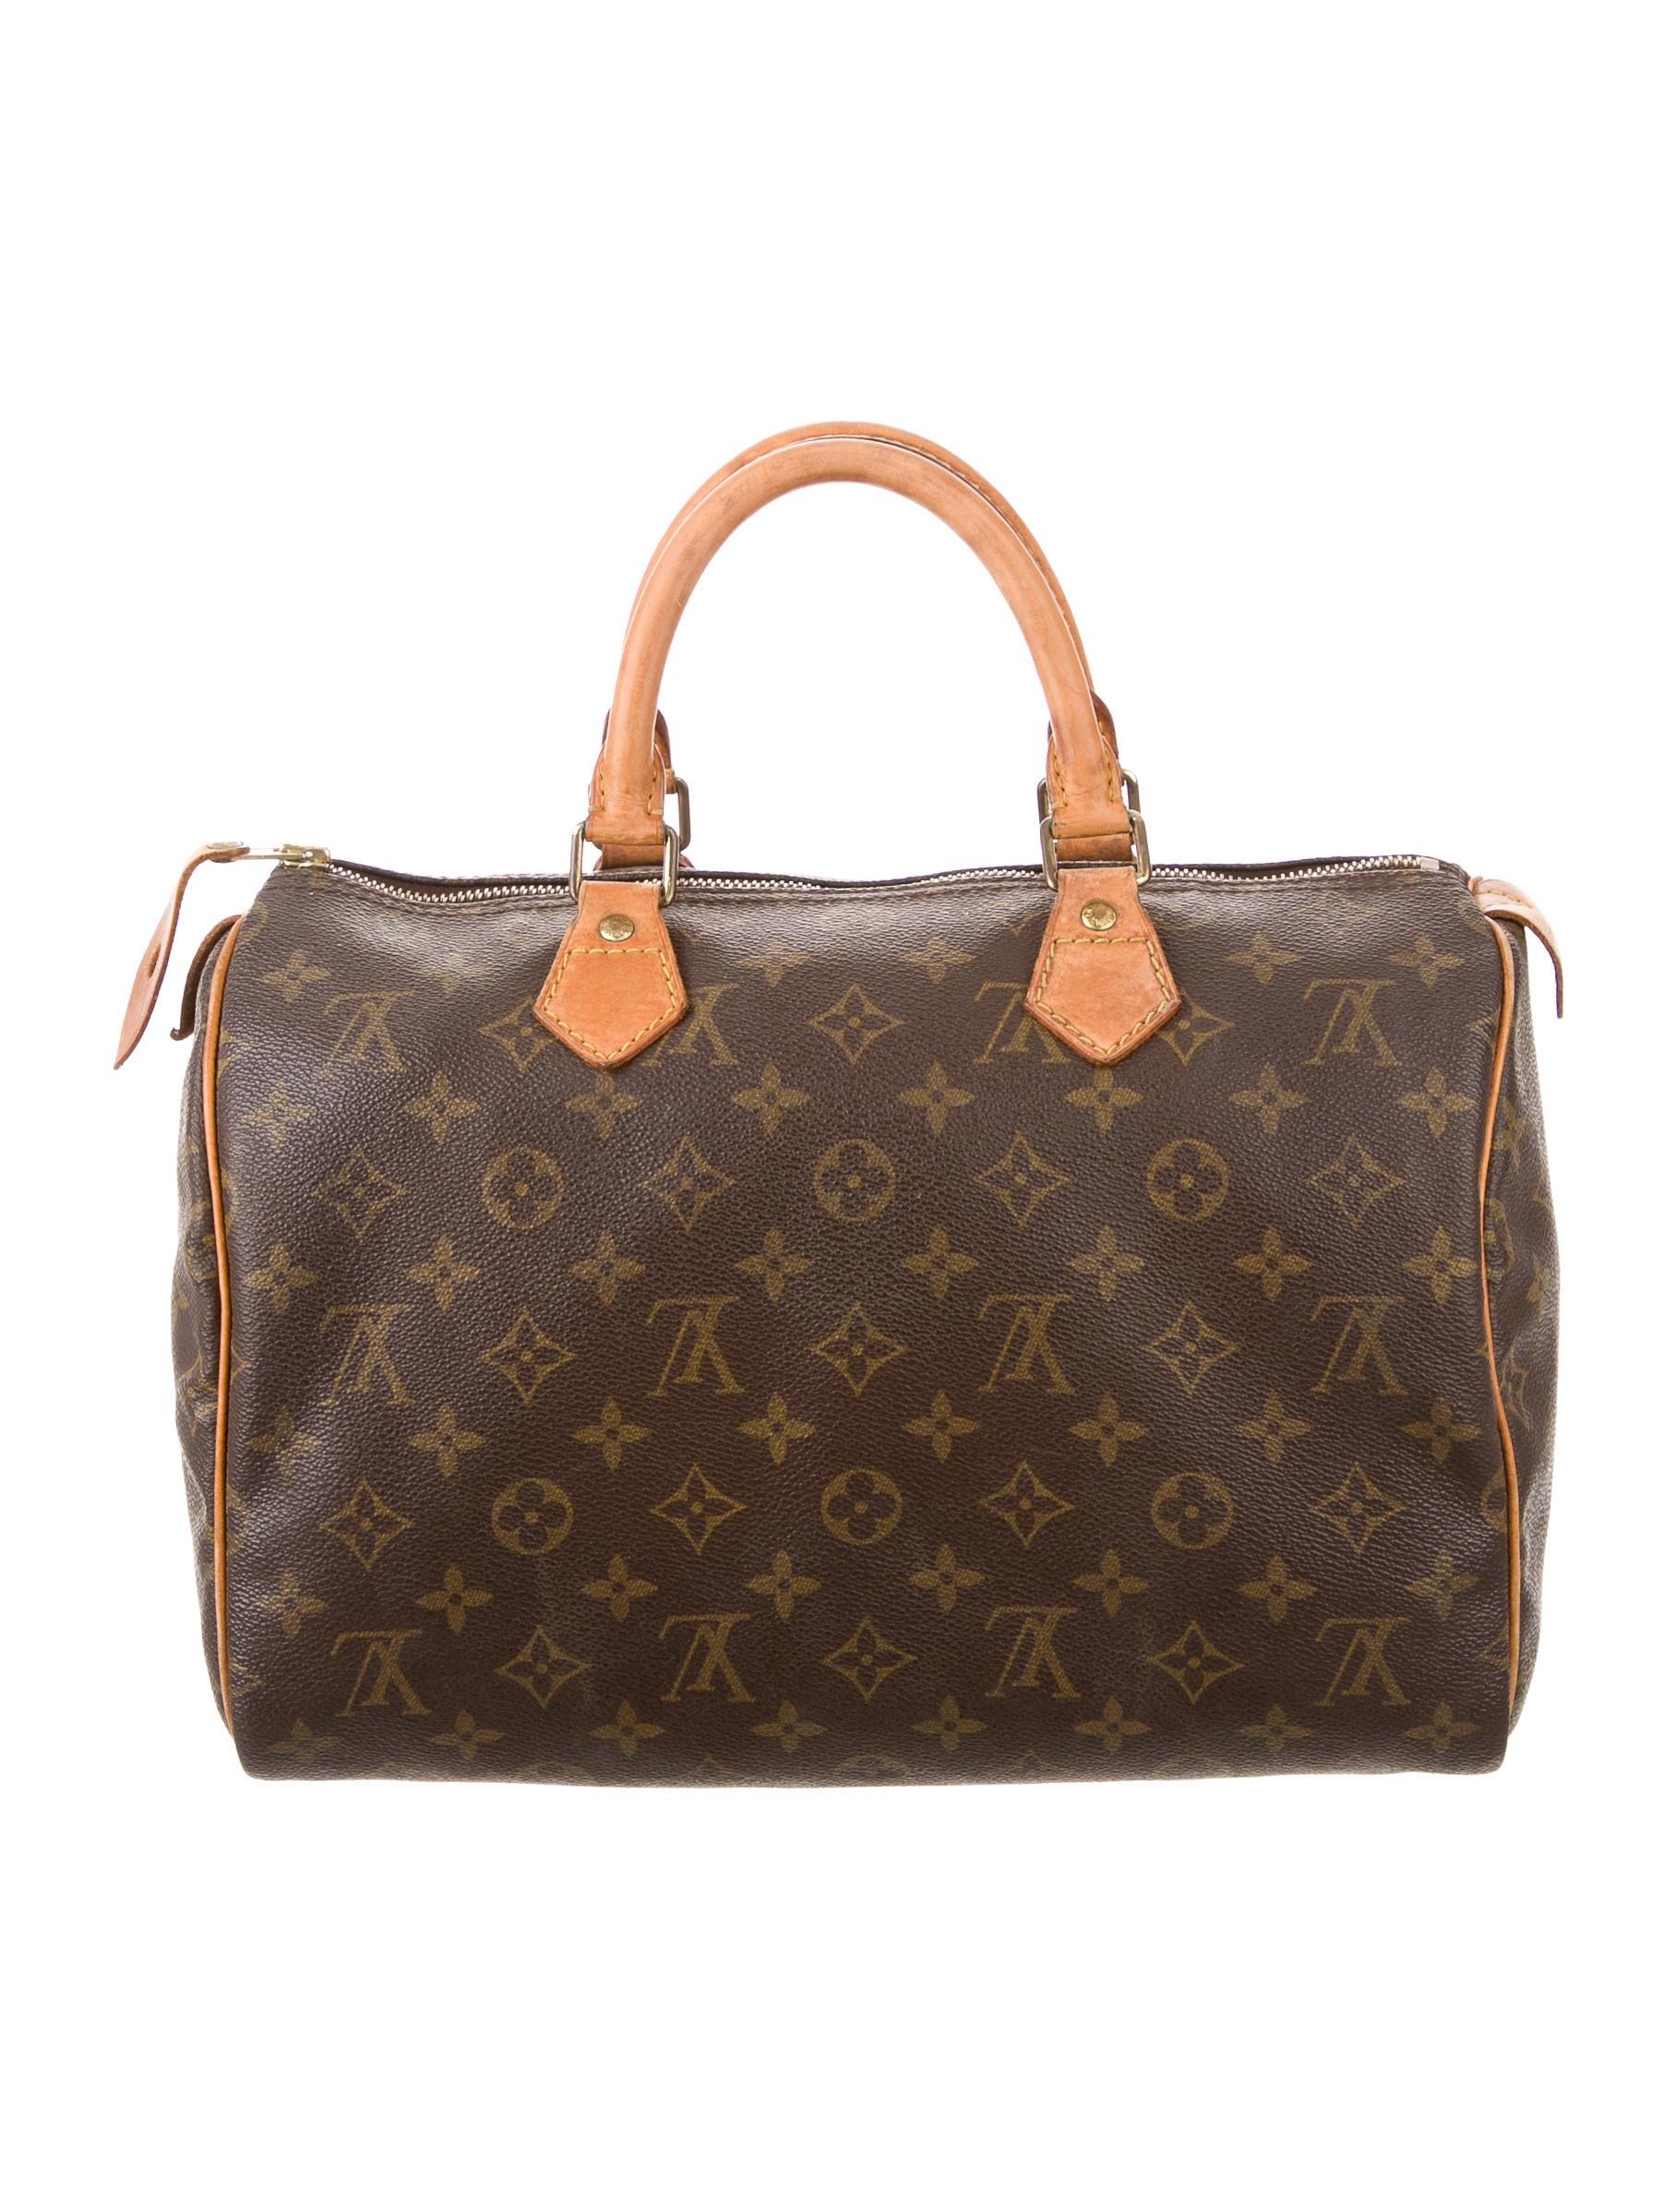 Louis vuitton monogram speedy 30 handbags lou107160 for Louis vuitton miroir speedy 30